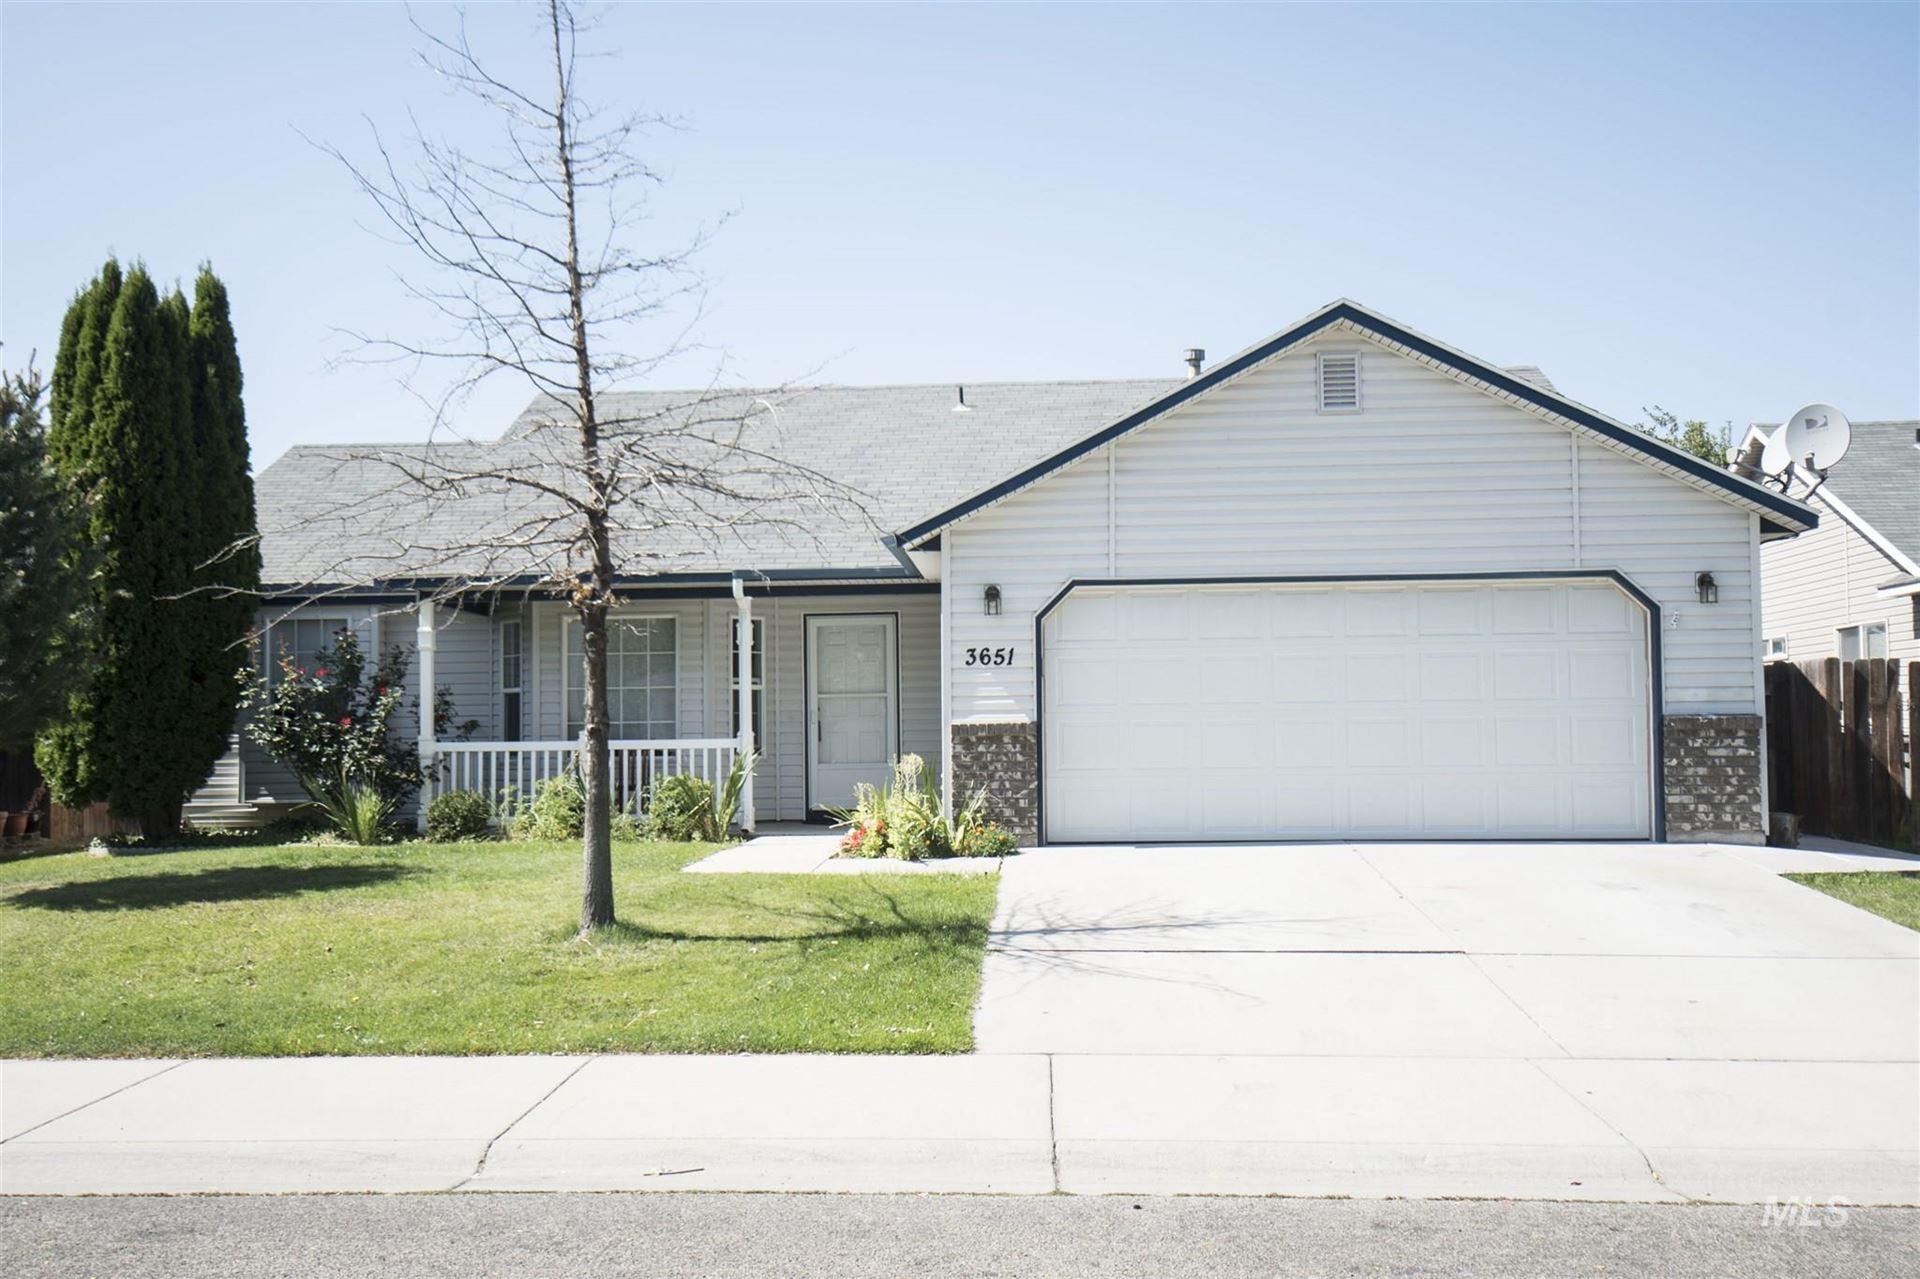 3651 N BOTTLE BRUSH, Boise, ID 83713 - MLS#: 98779879